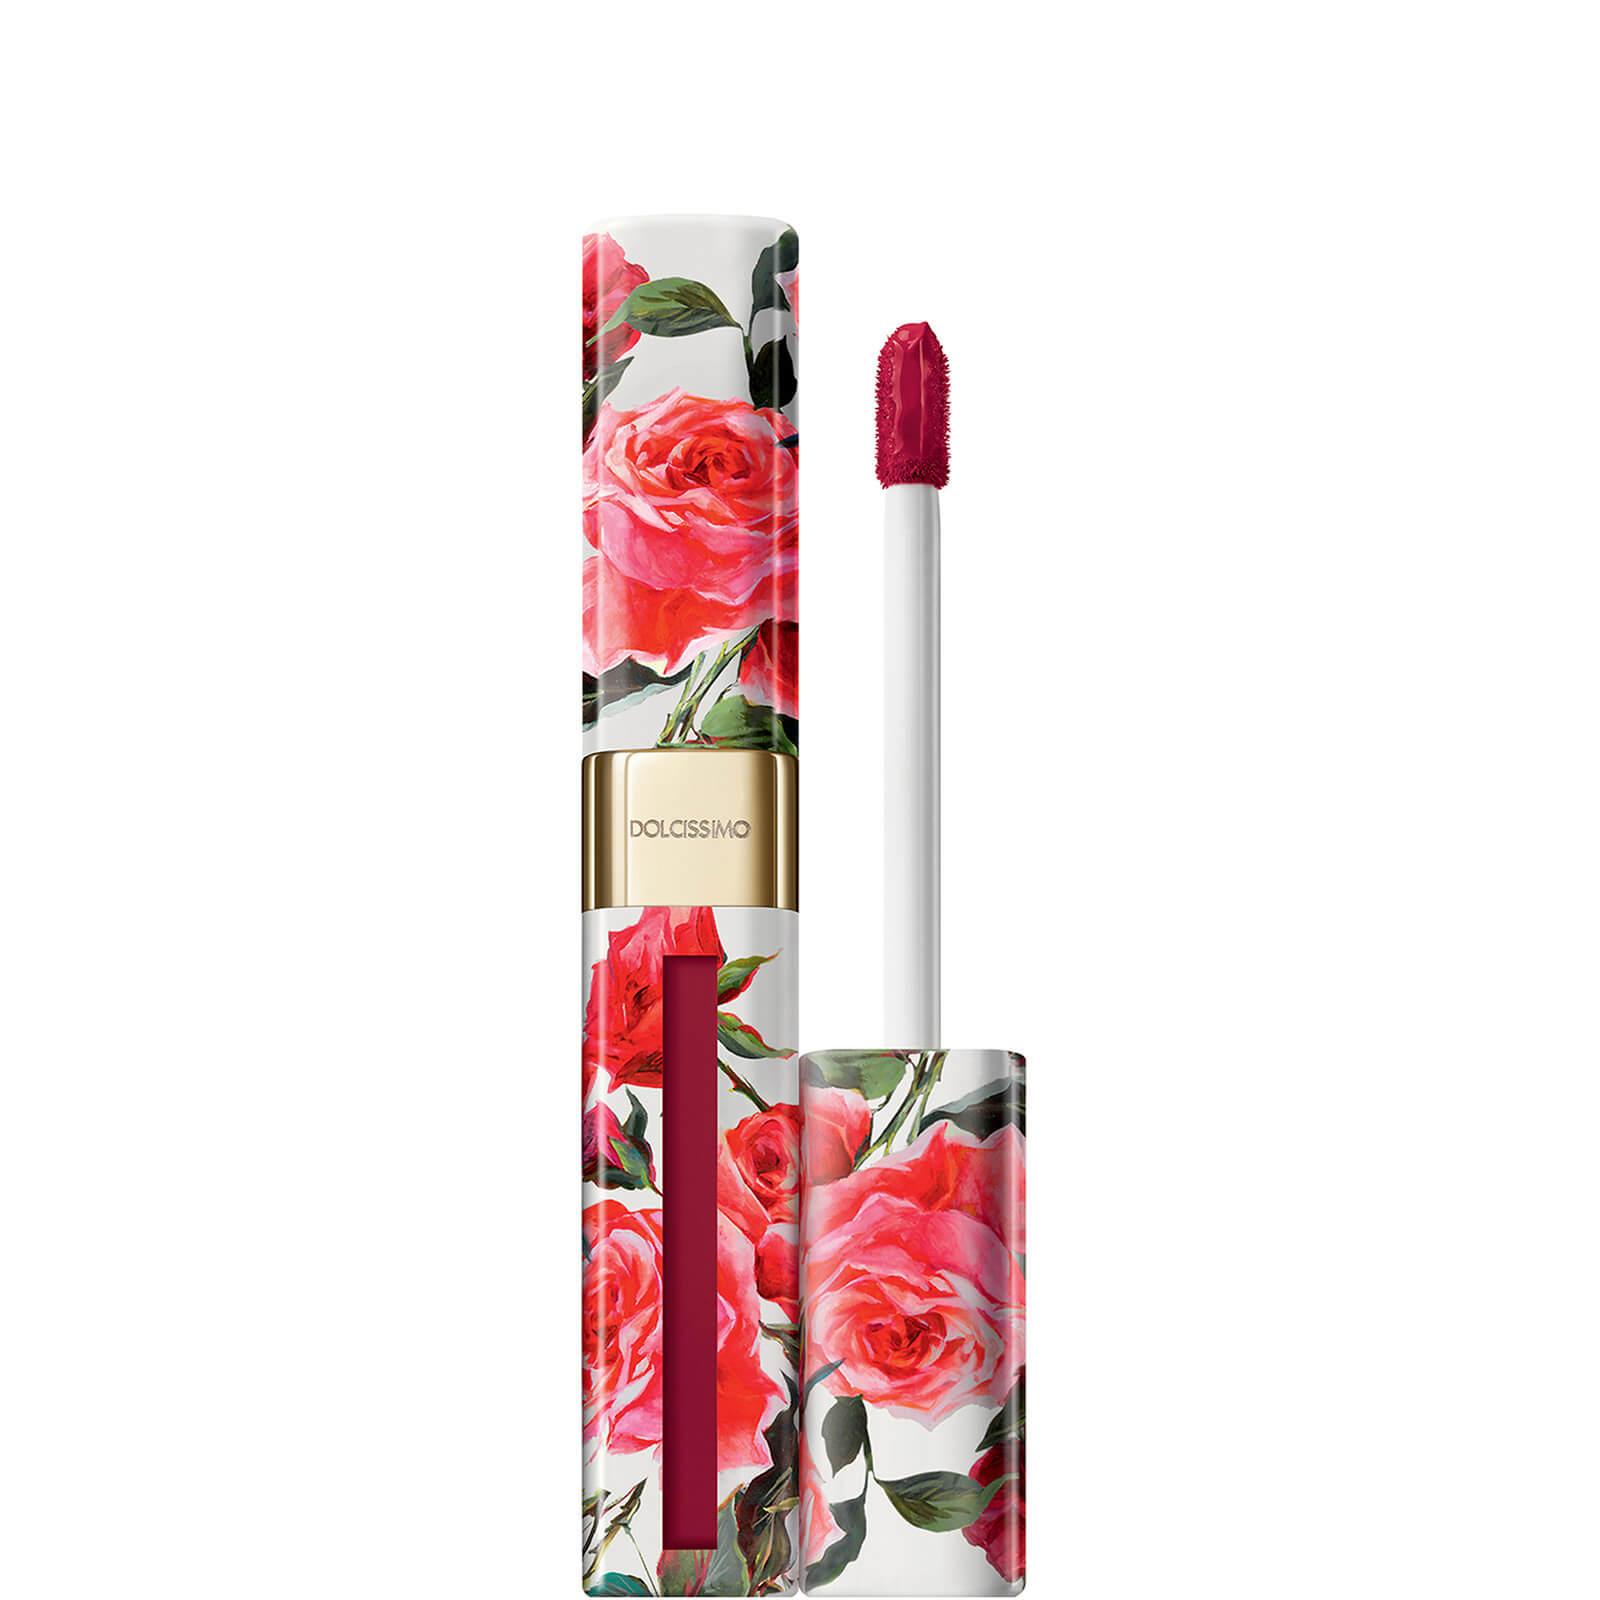 Dolce&Gabbana Dolcissimo Liquid Lipcolour 5ml (Various Shades) - Ruby 10